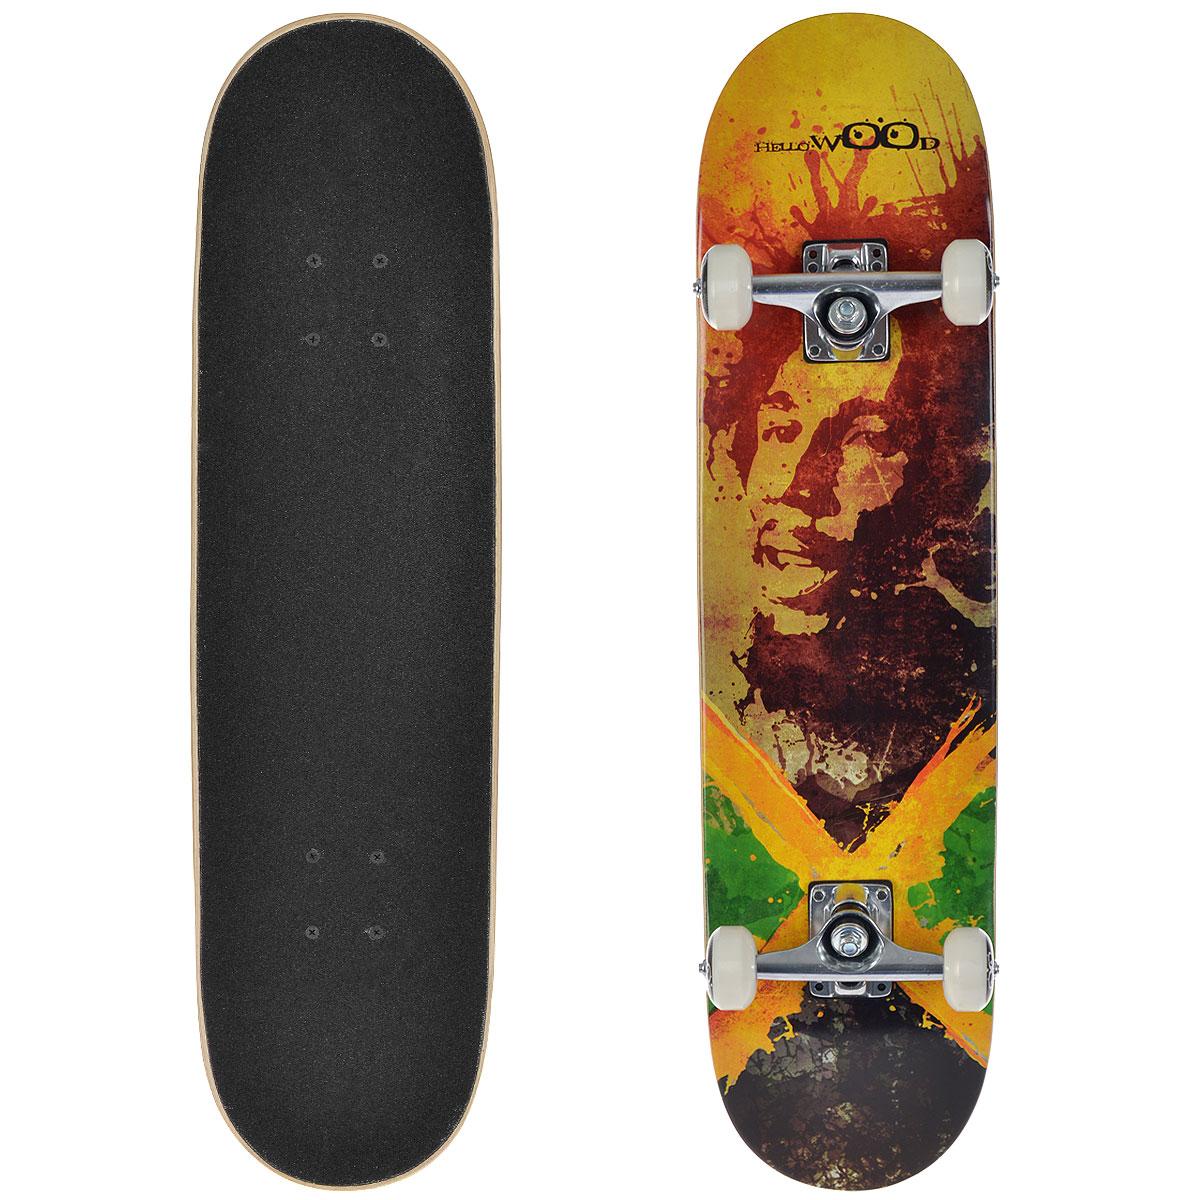 "Скейтборд HelloWood ""Marley"", дека 79 см х 20 см"